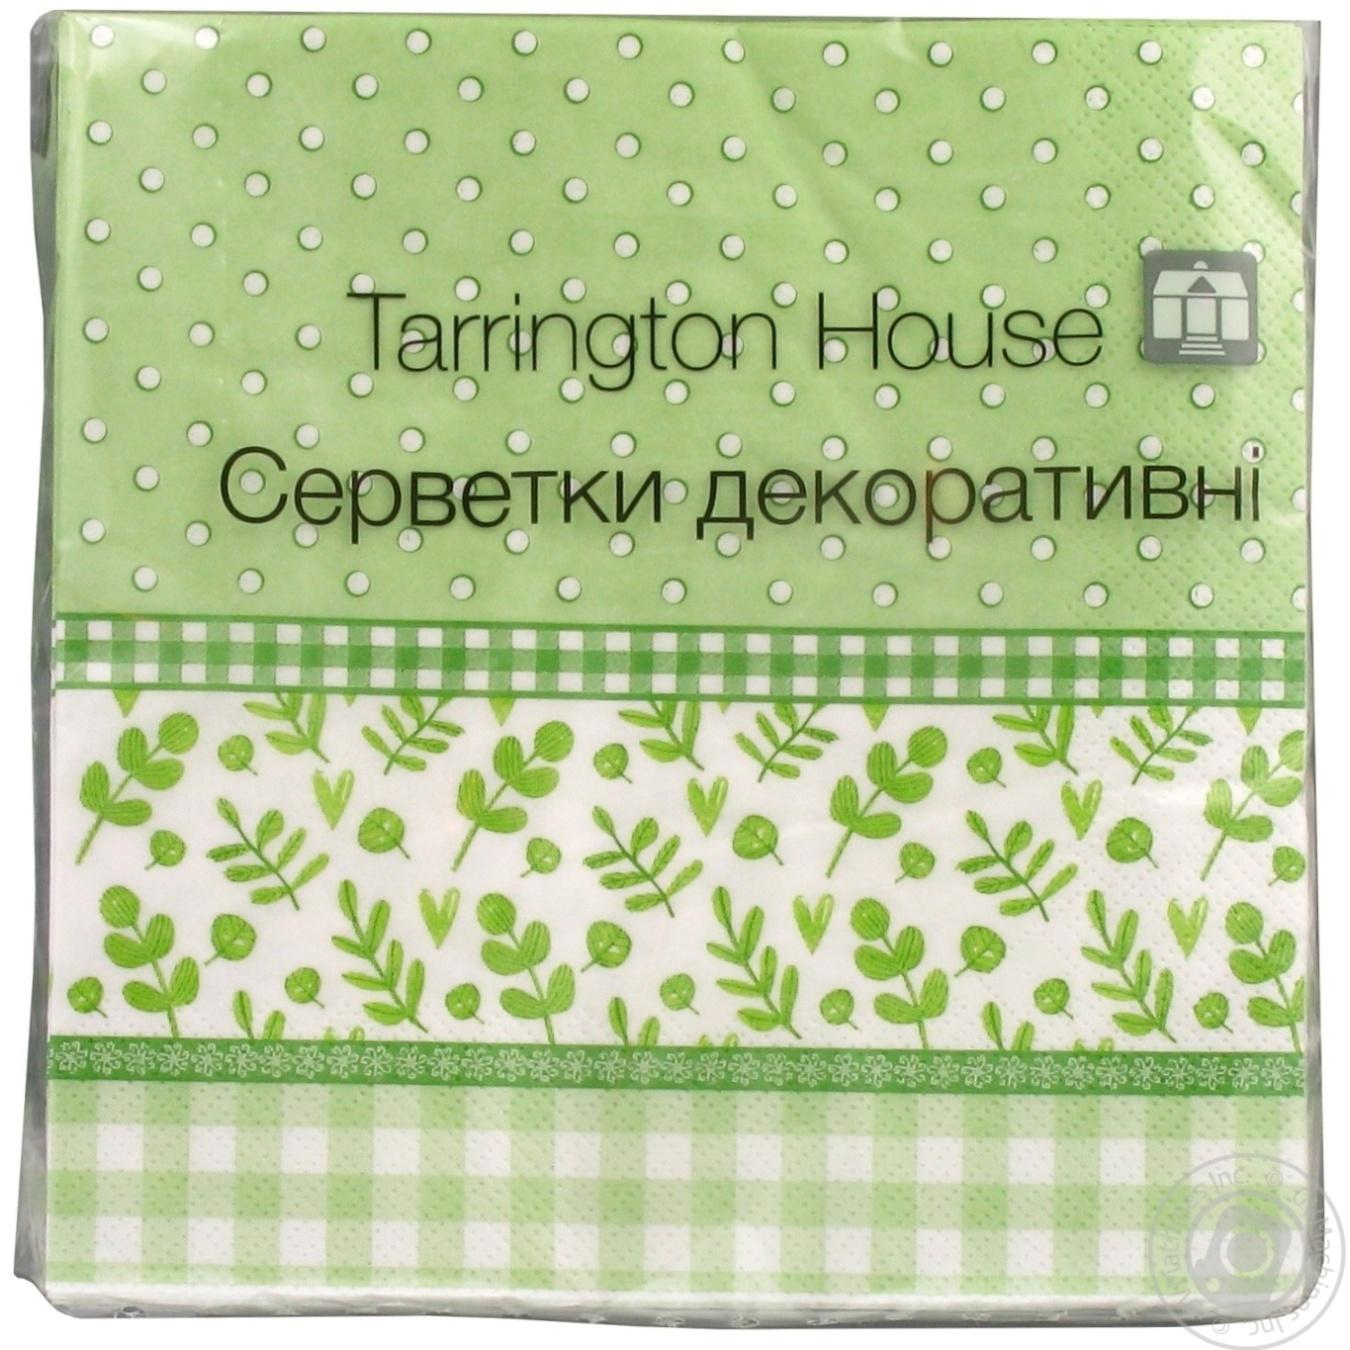 Купить 623, Серветки Silken паперові Тартан 3шар. 18шт х18, Tarrington House